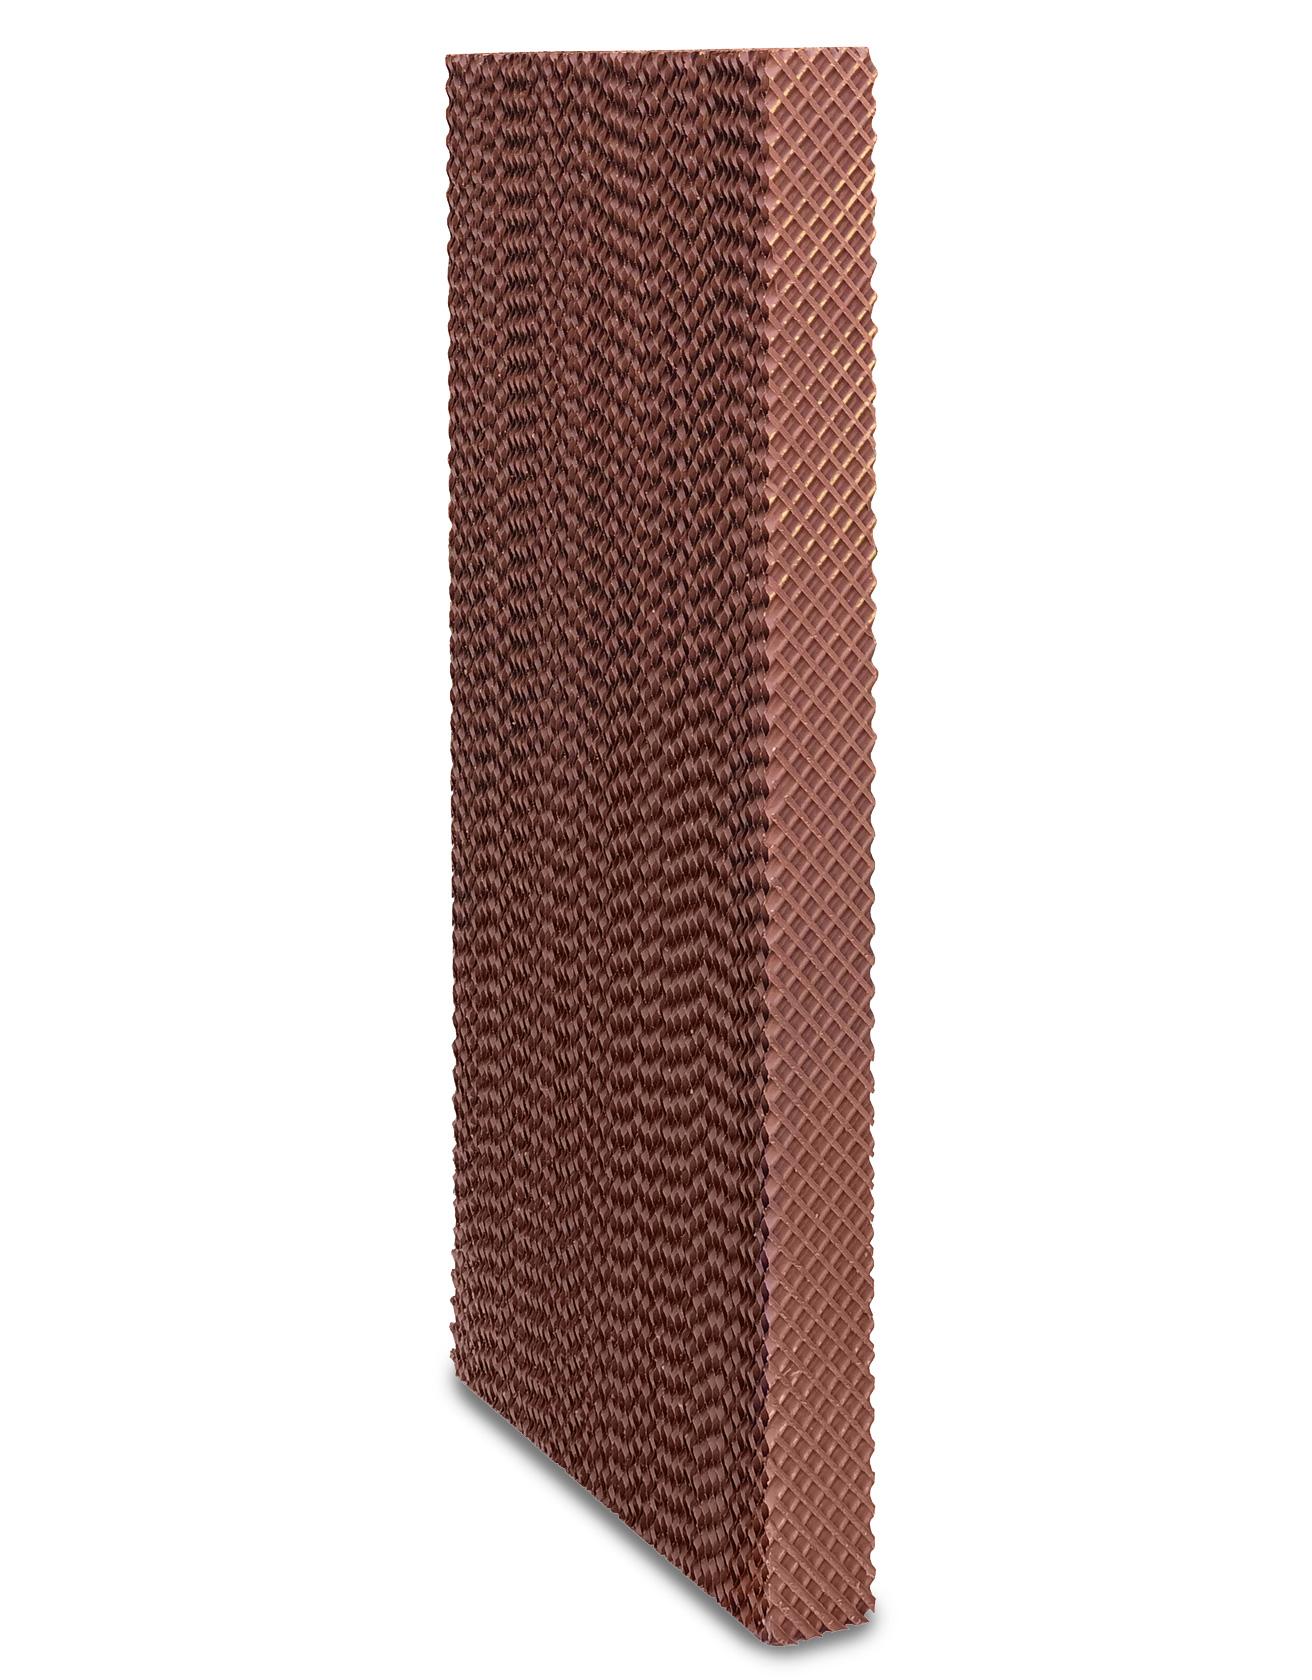 NTA Evaporative Nano Cooling Pad 5090-10cm